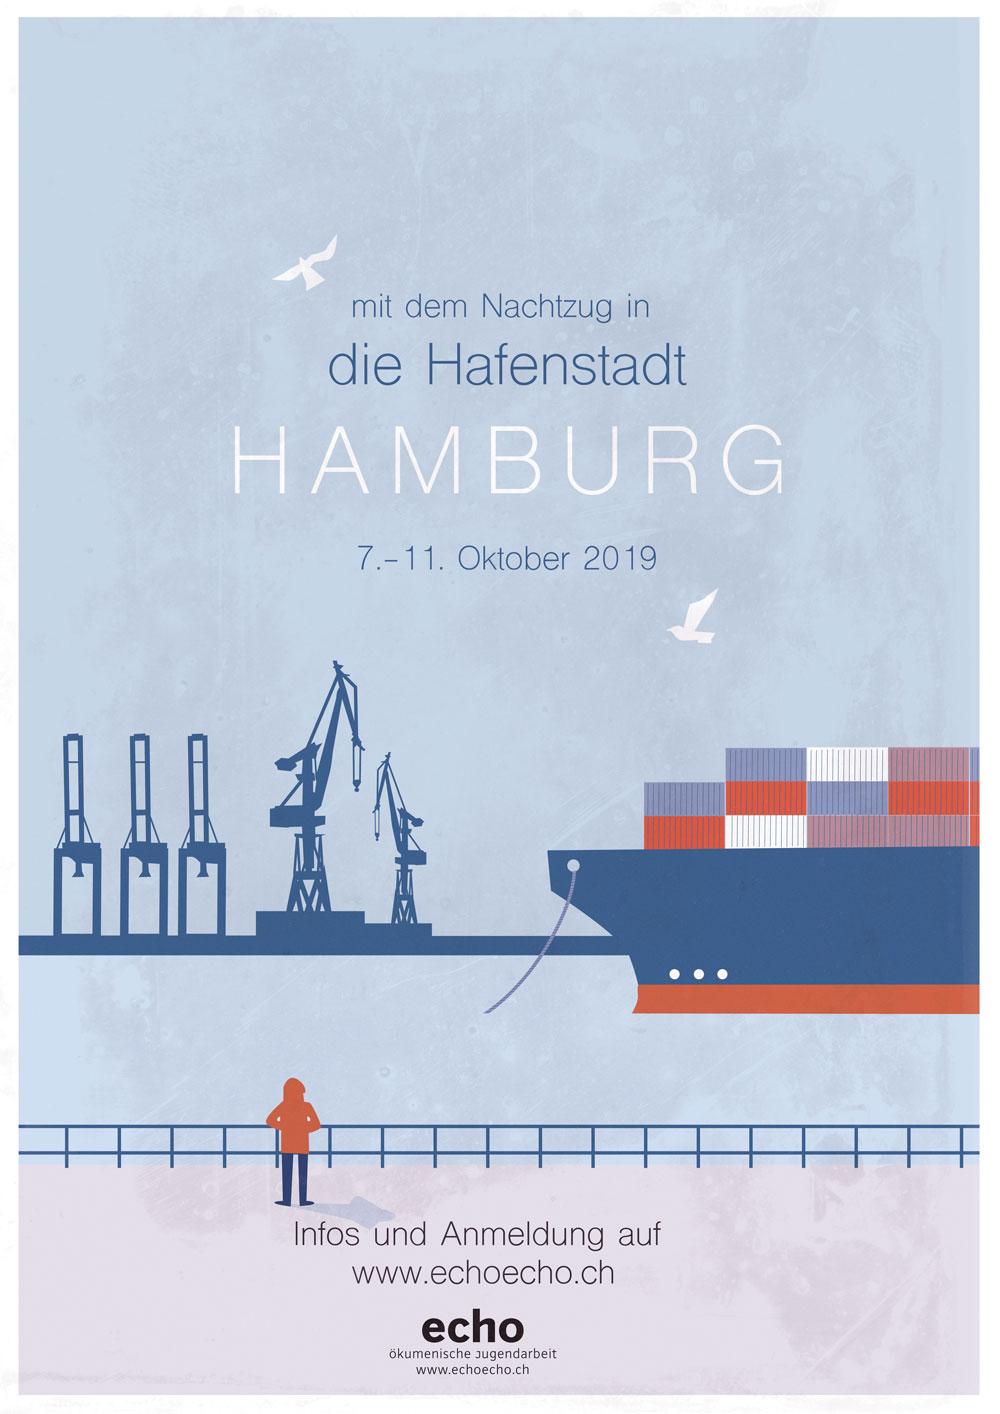 Hamburg-Reise 2019